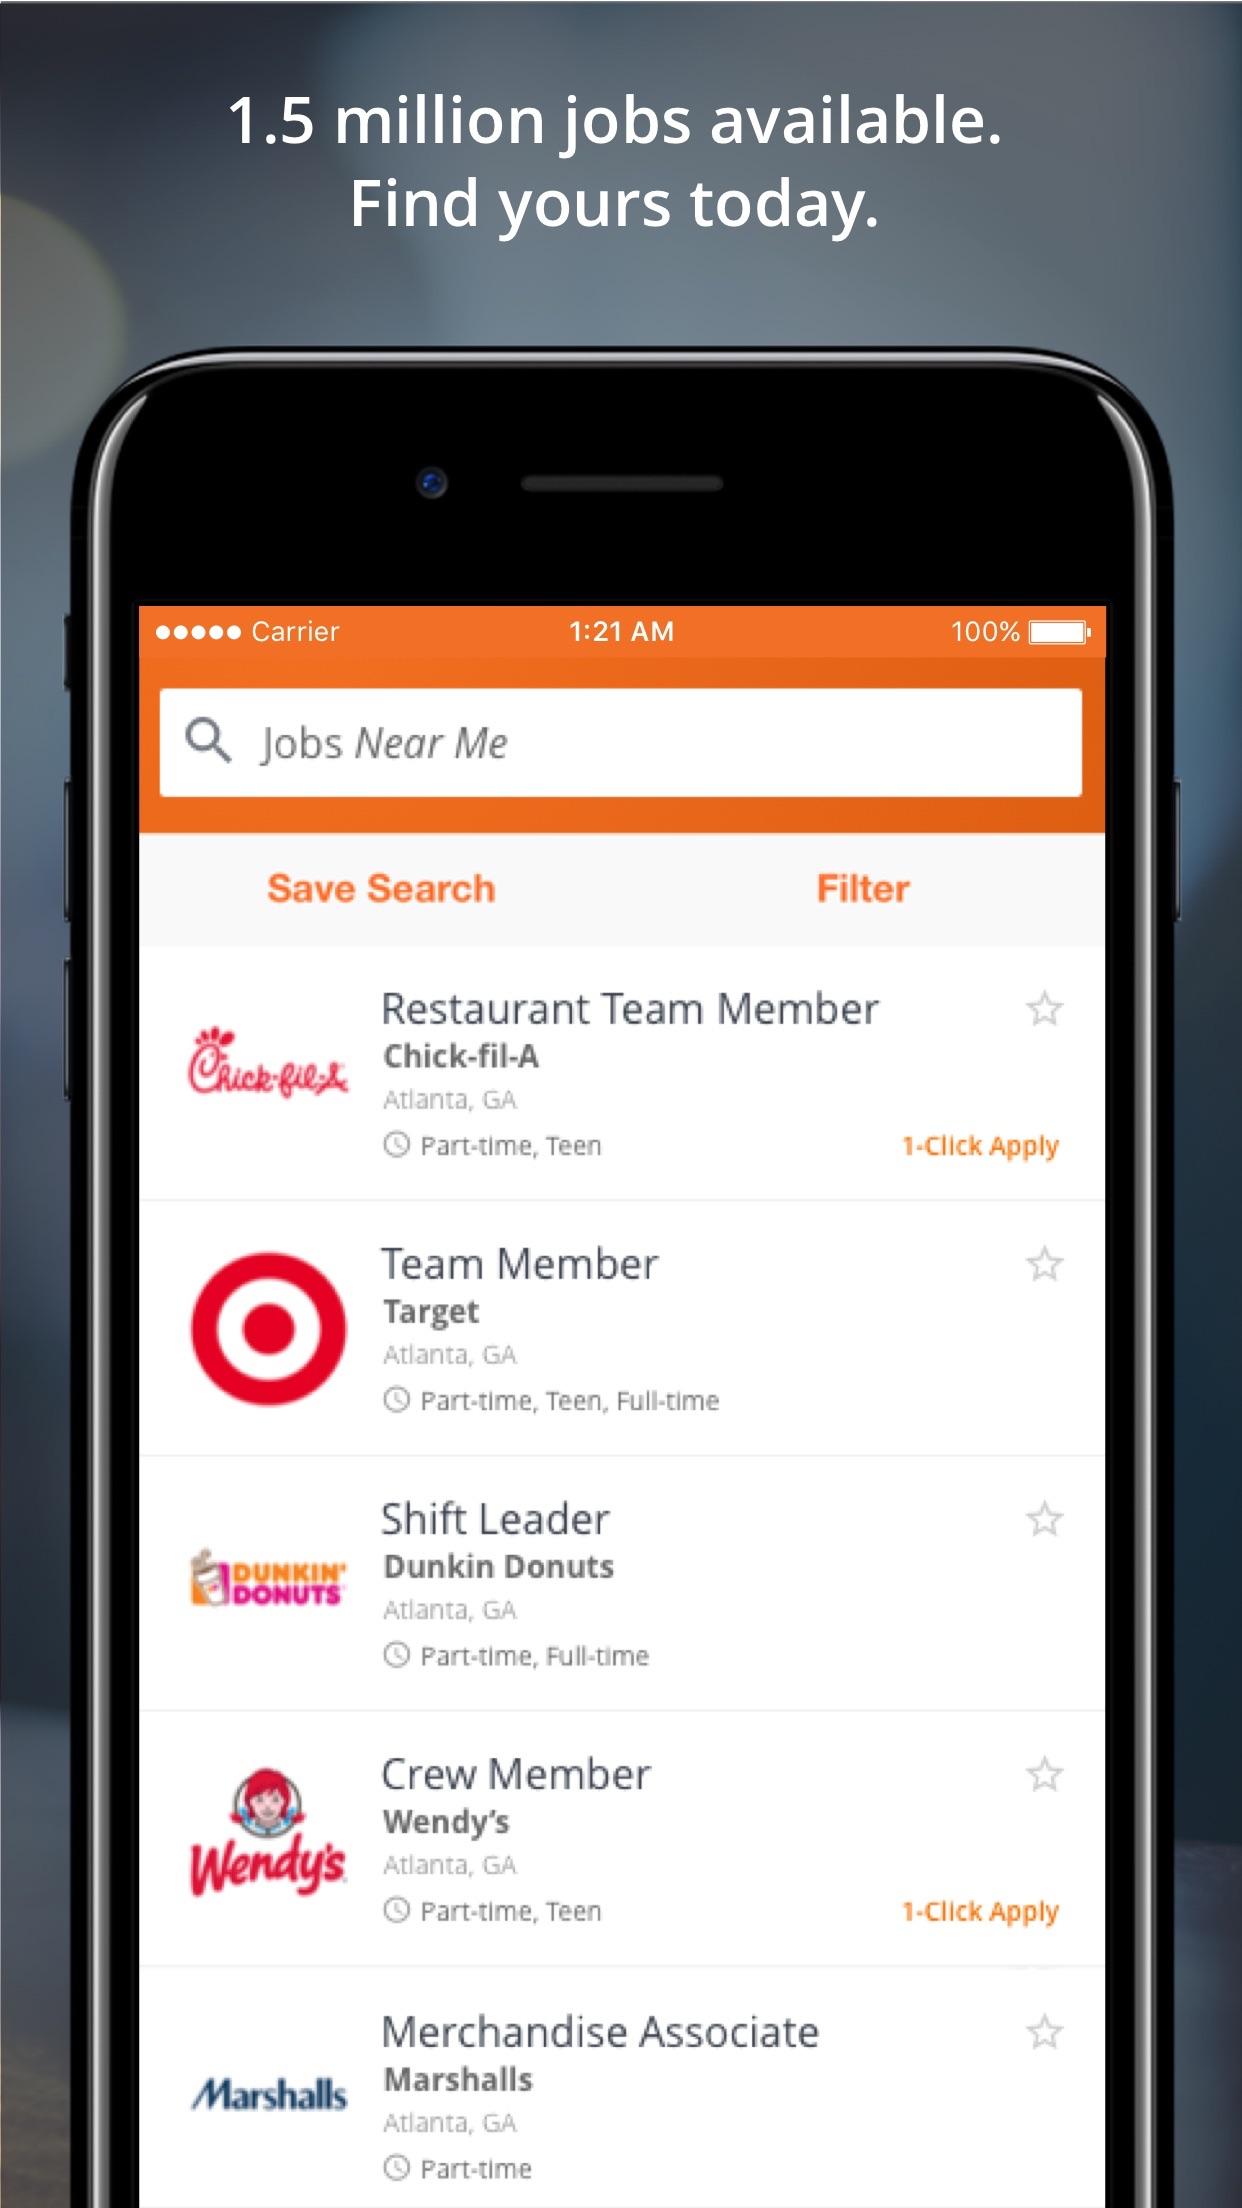 Snagajob - Jobs Hiring Now Screenshot